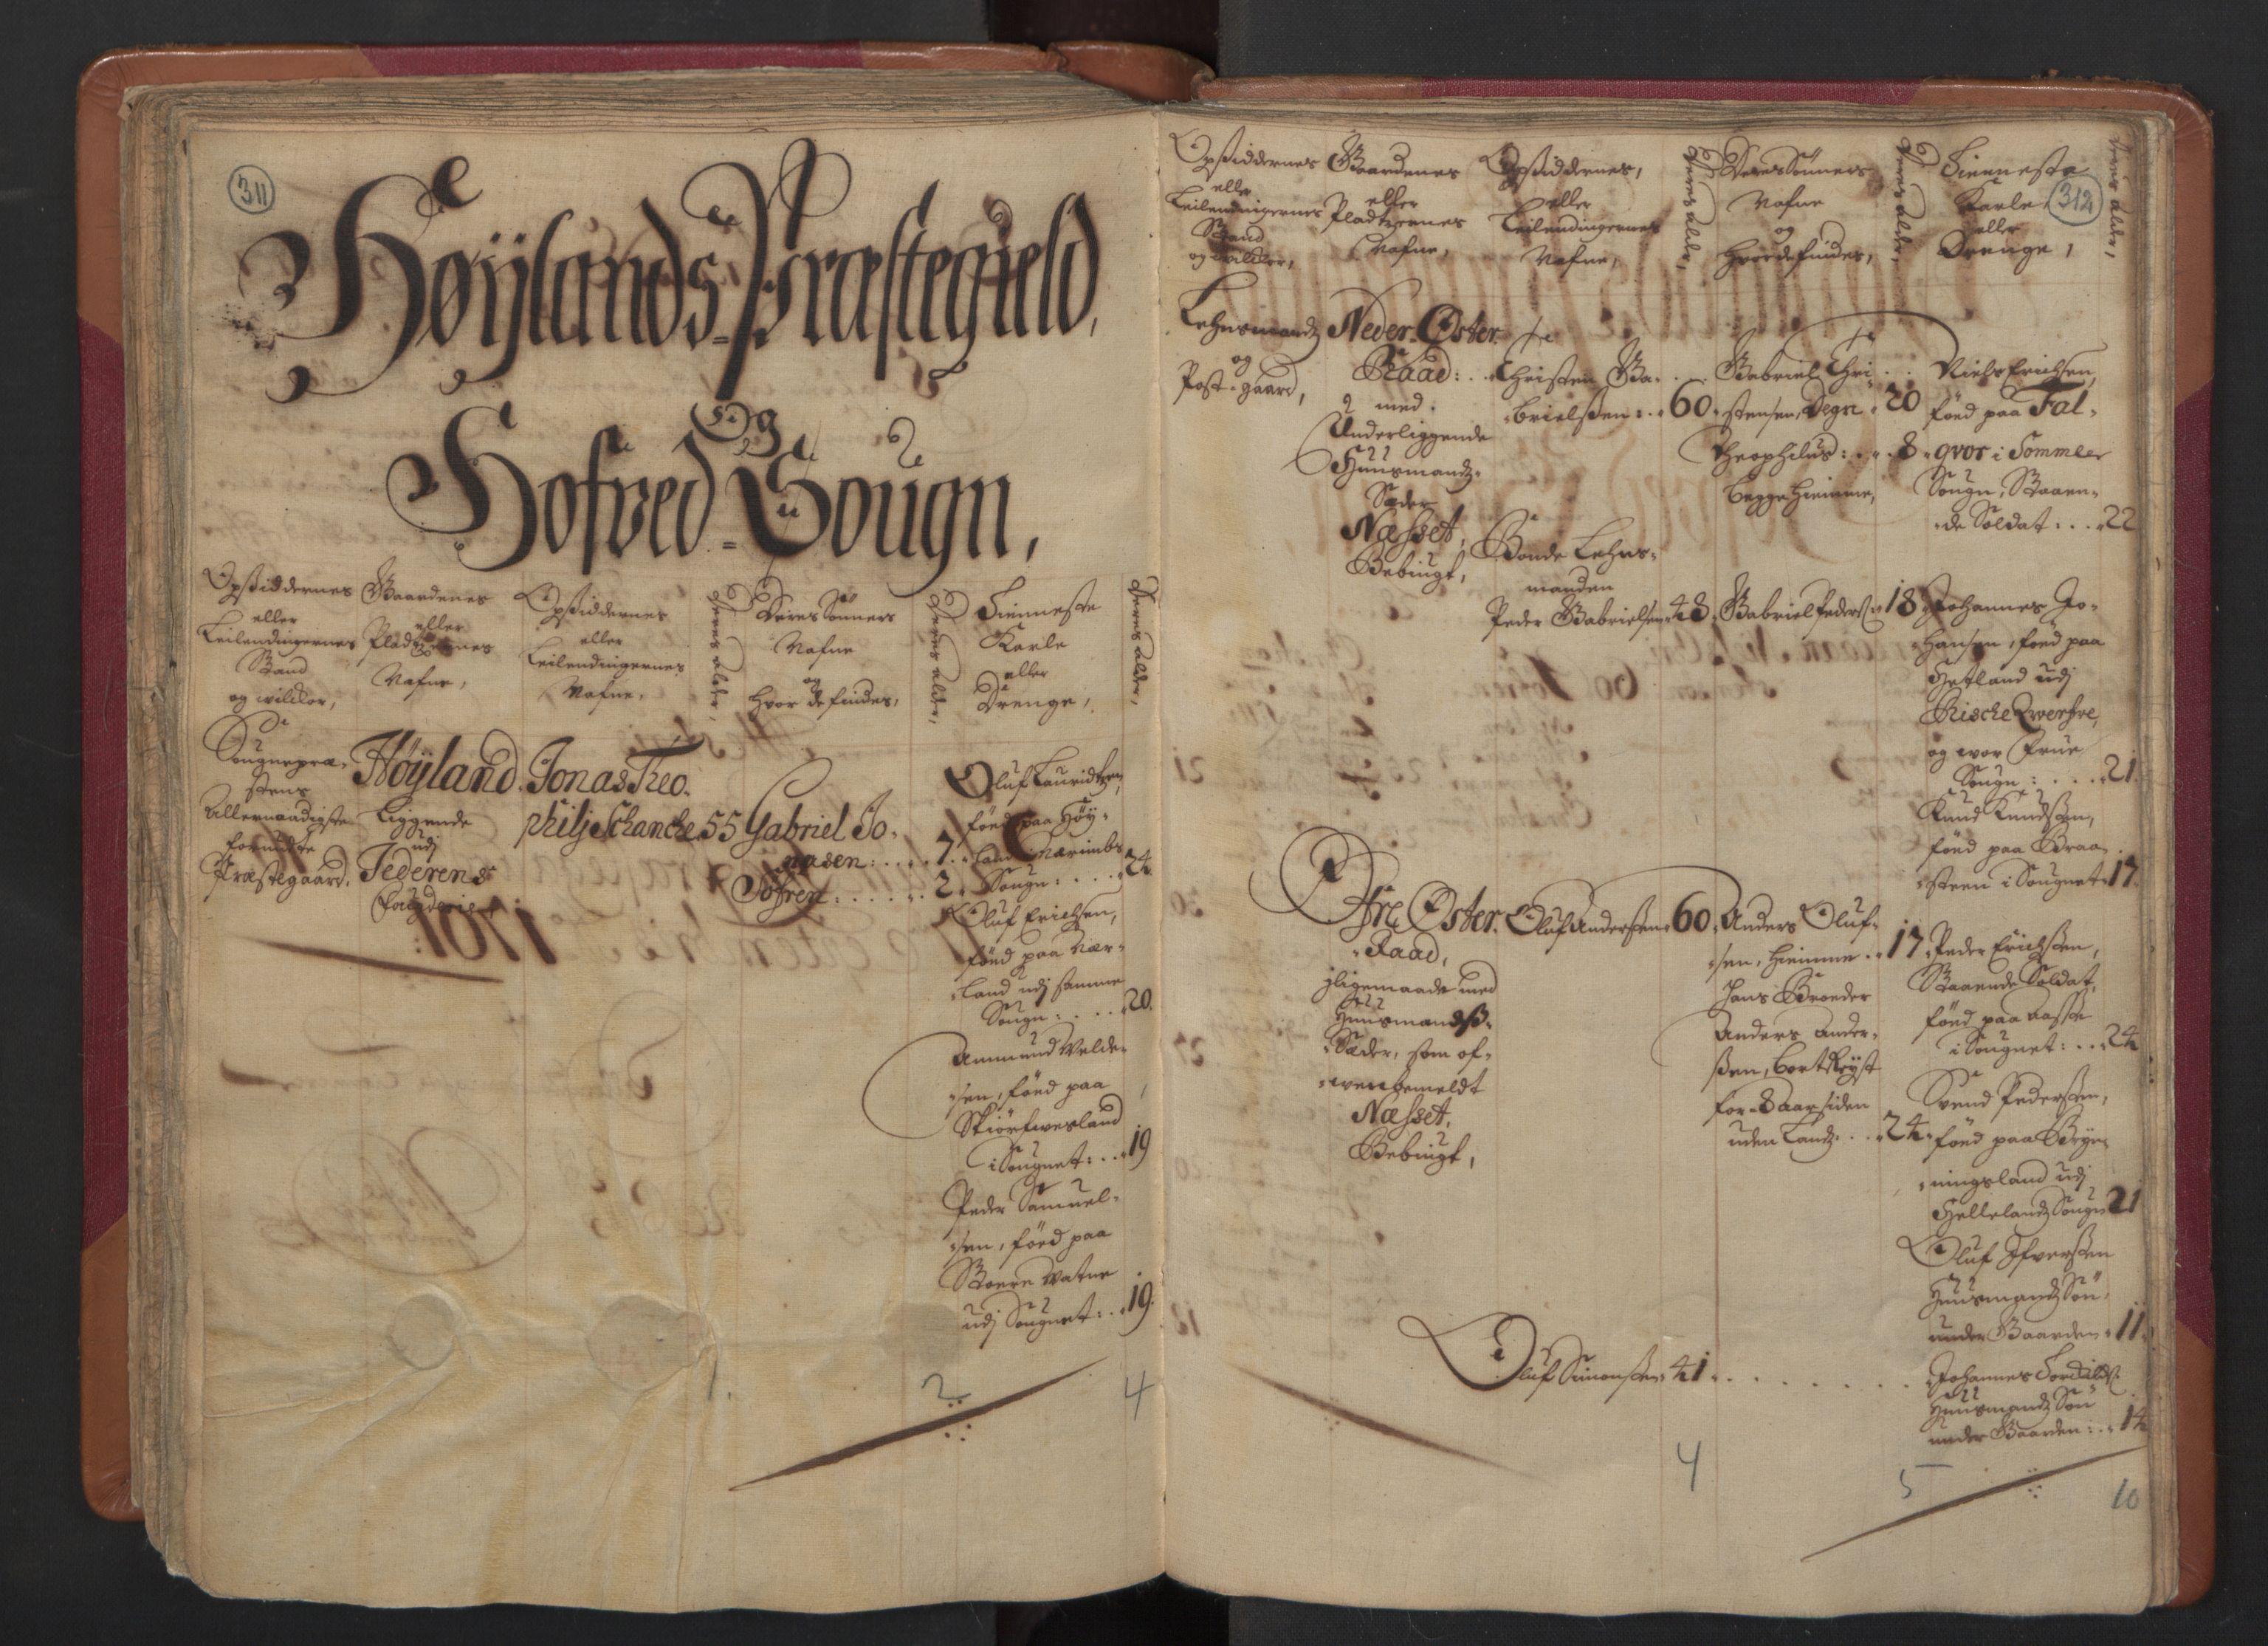 RA, Manntallet 1701, nr. 4: Jæren og Dalane fogderi, 1701, s. 311-312